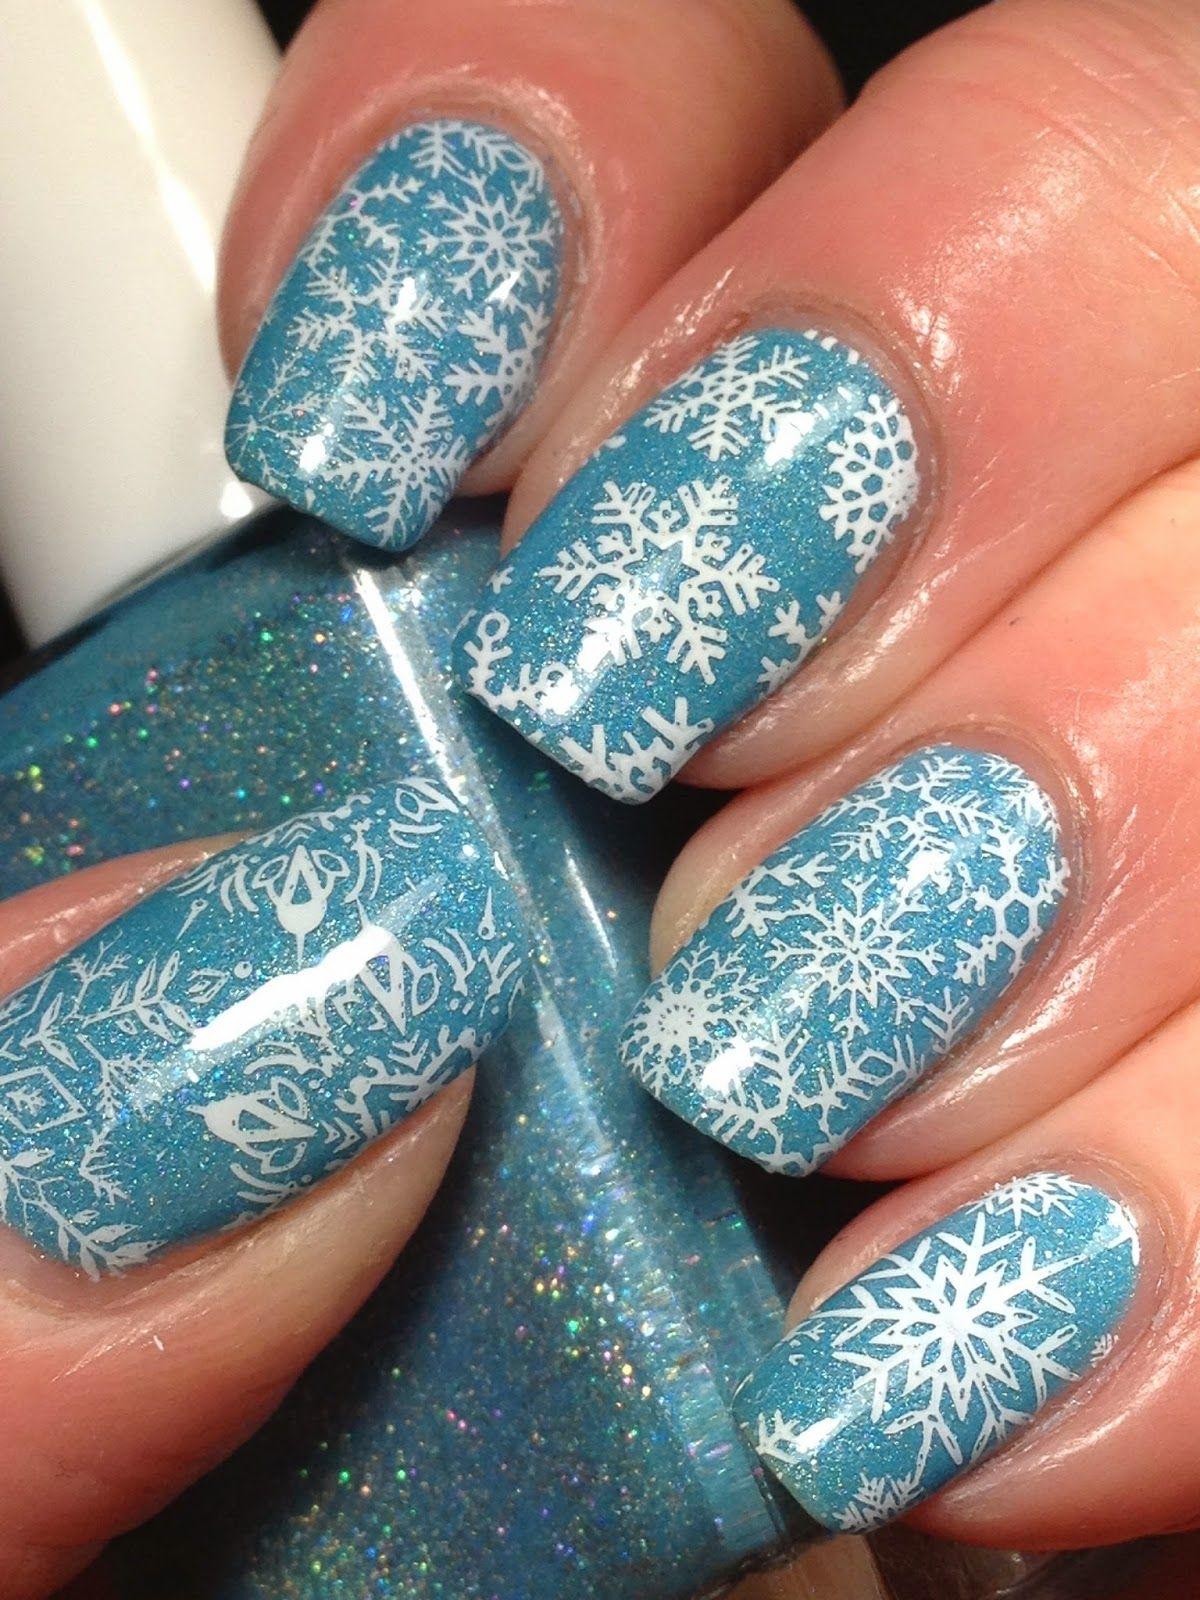 Glam Polish Break the Ice with Snowflakes